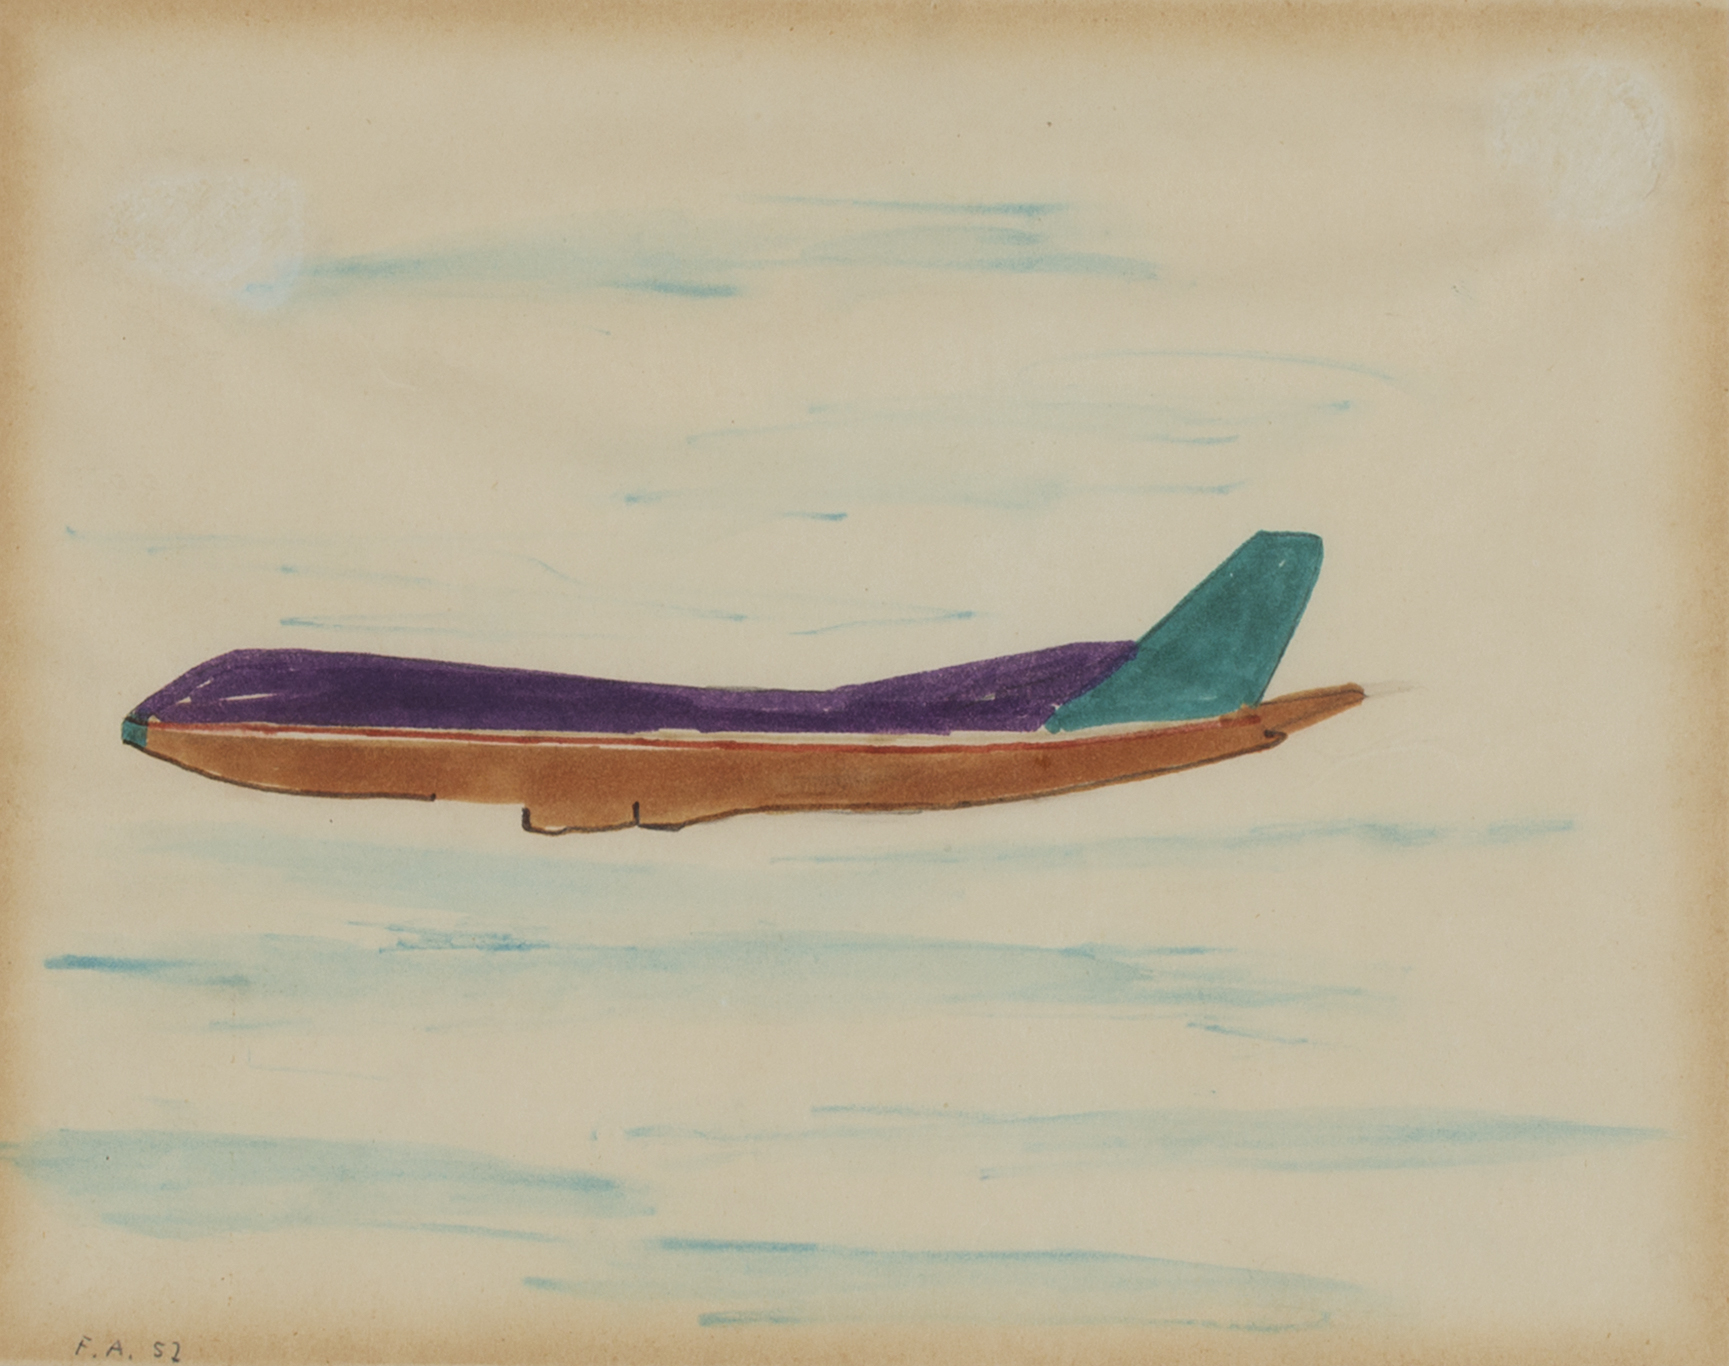 Senza titolo-aereo, 1957